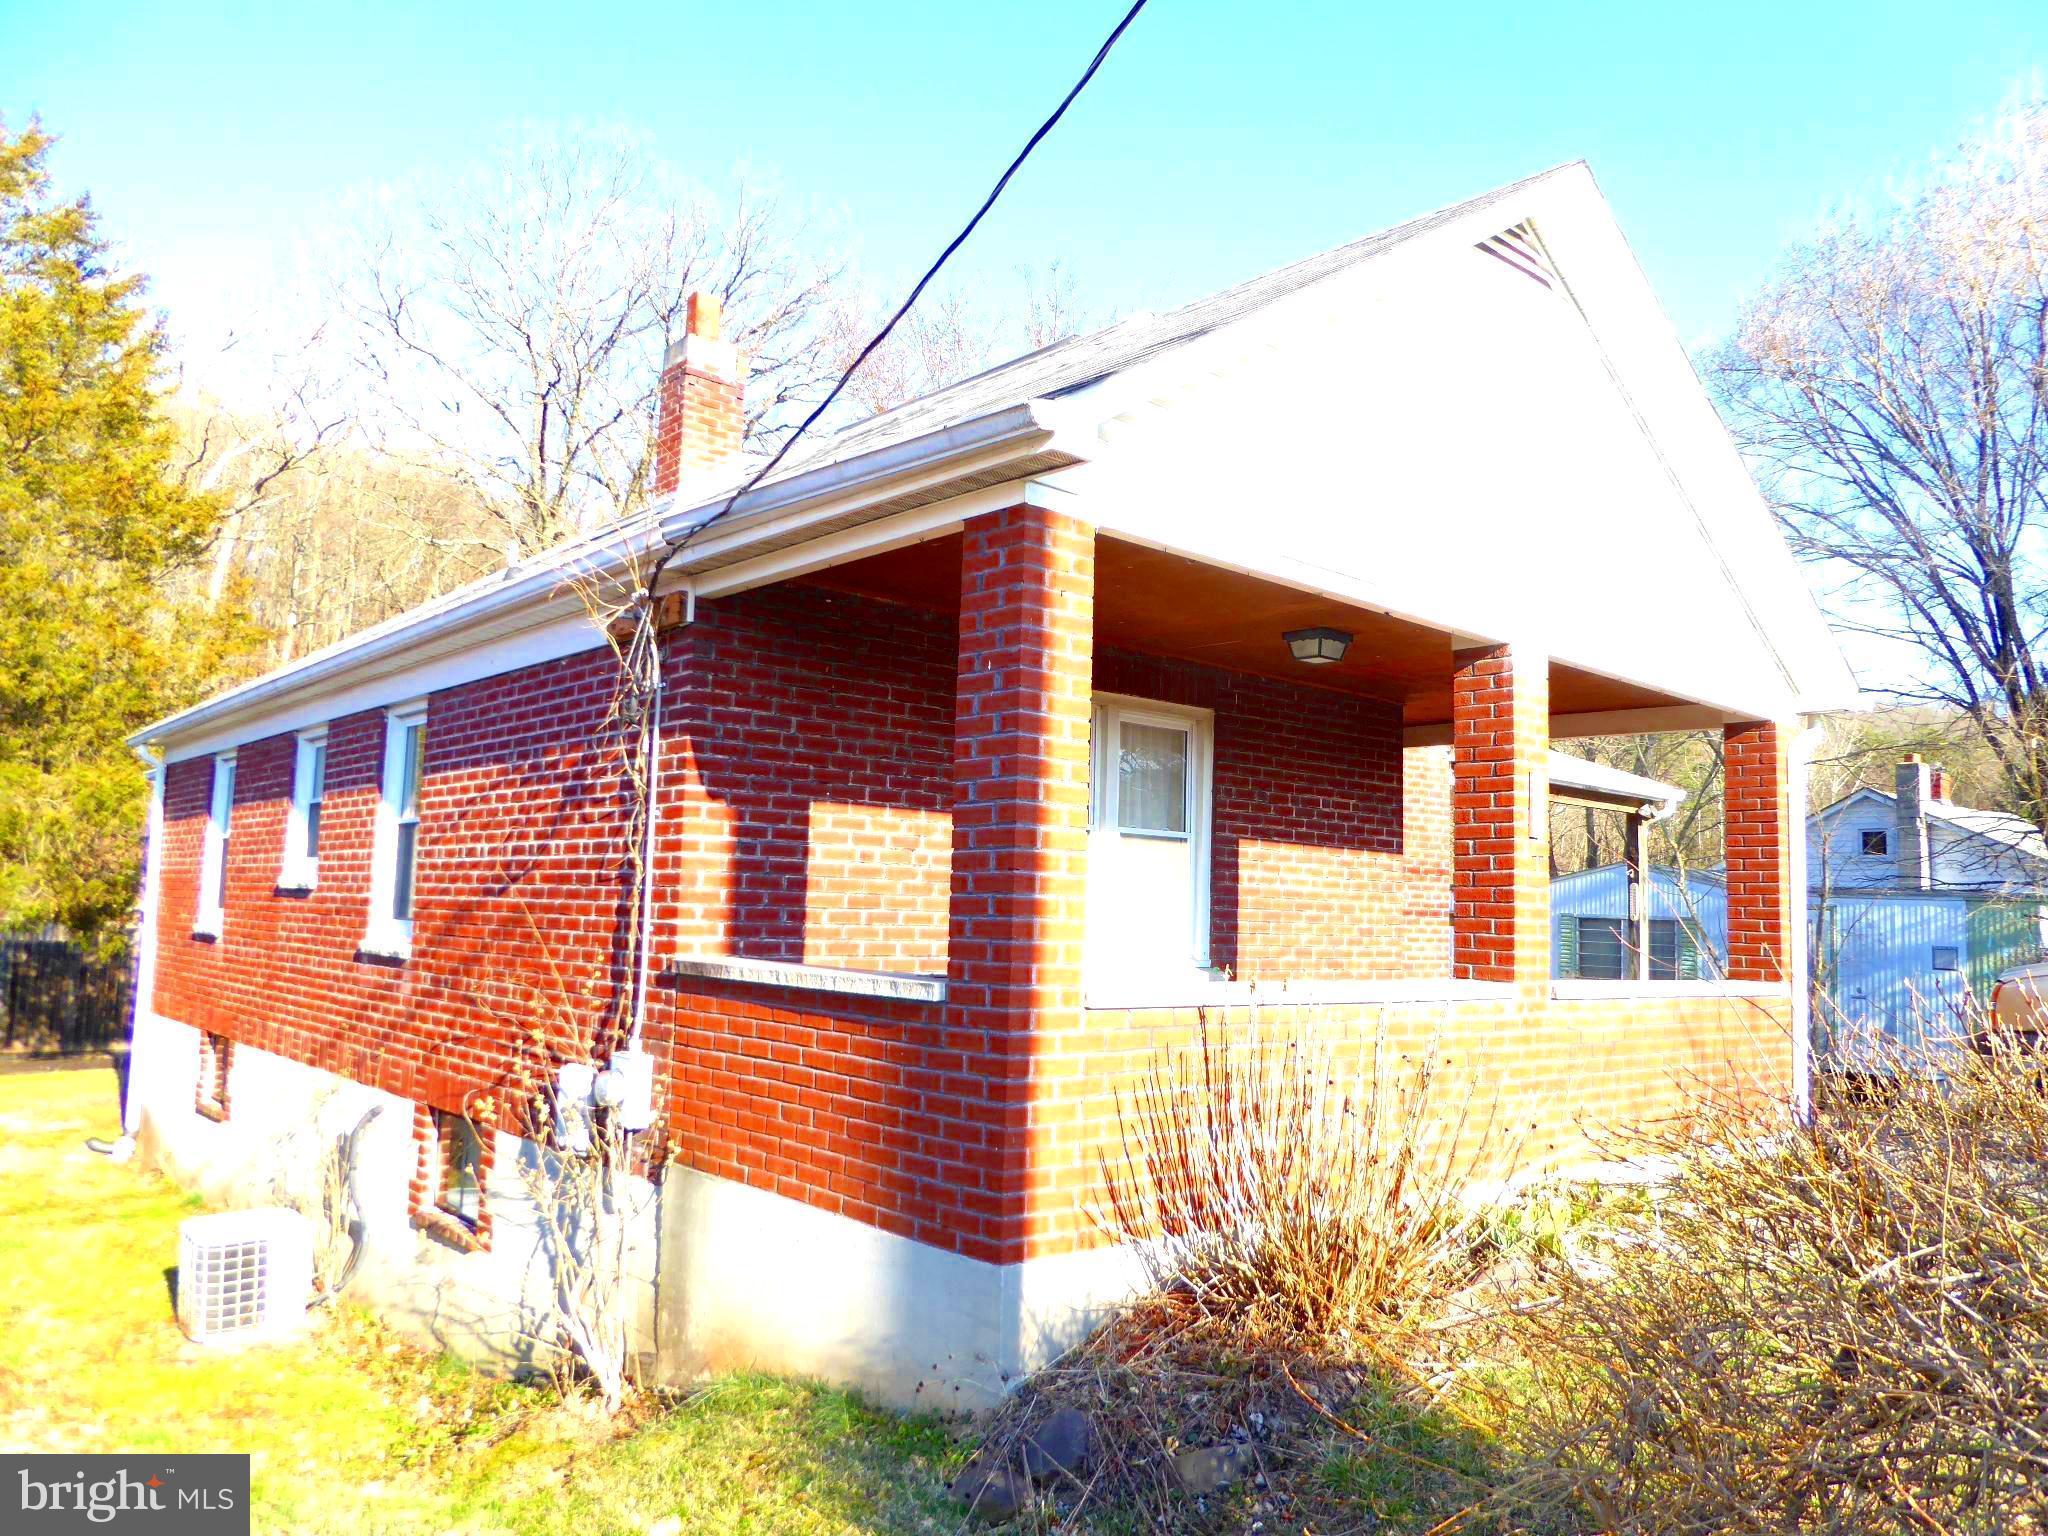 715 HENRY W MILLER BOULEVARD, PAW PAW, WV 25434